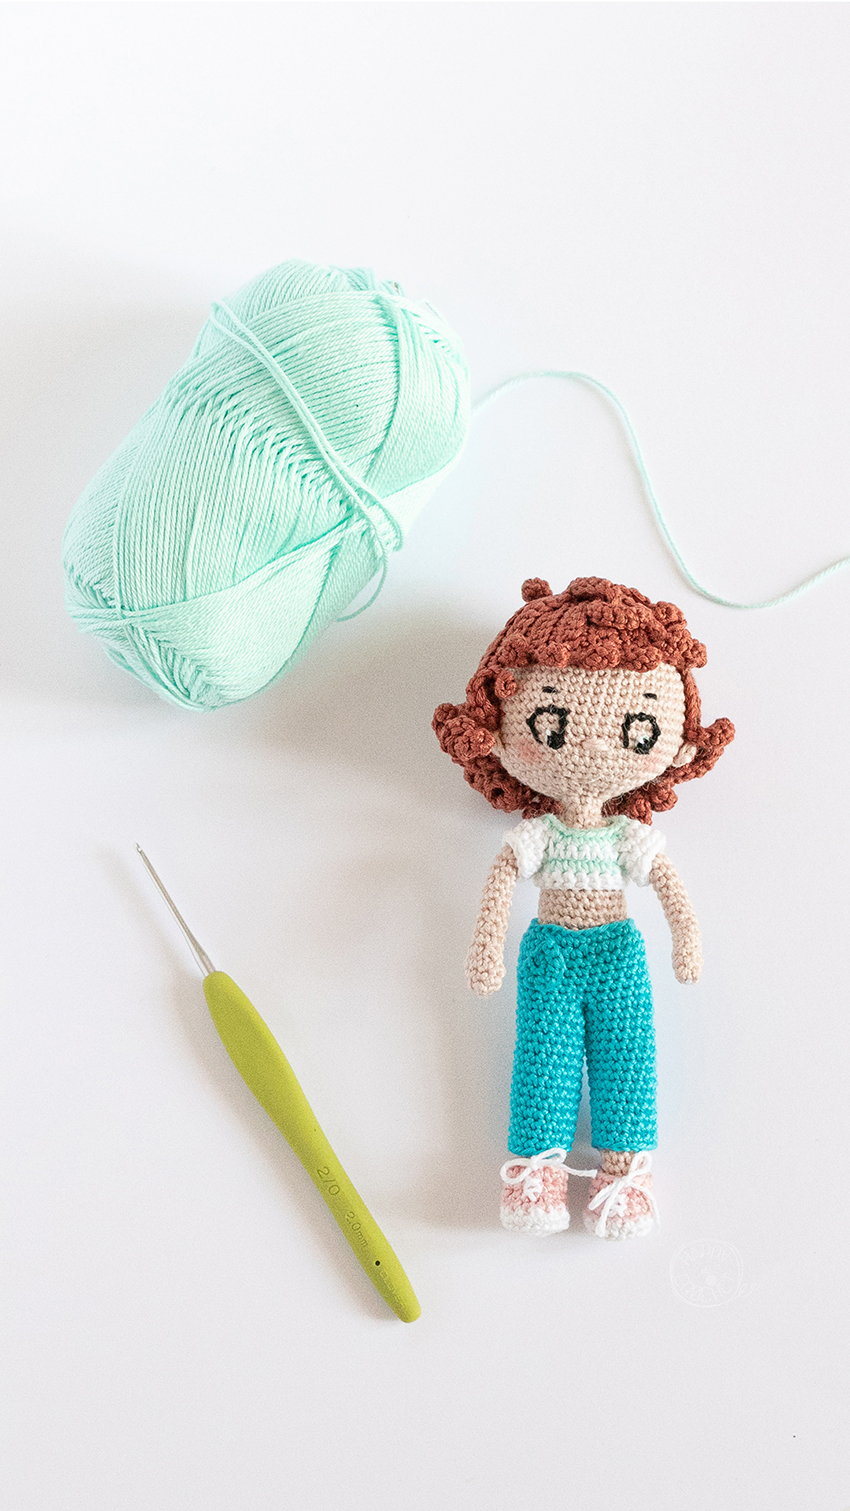 Eileen la poupée amigurumi au crochet